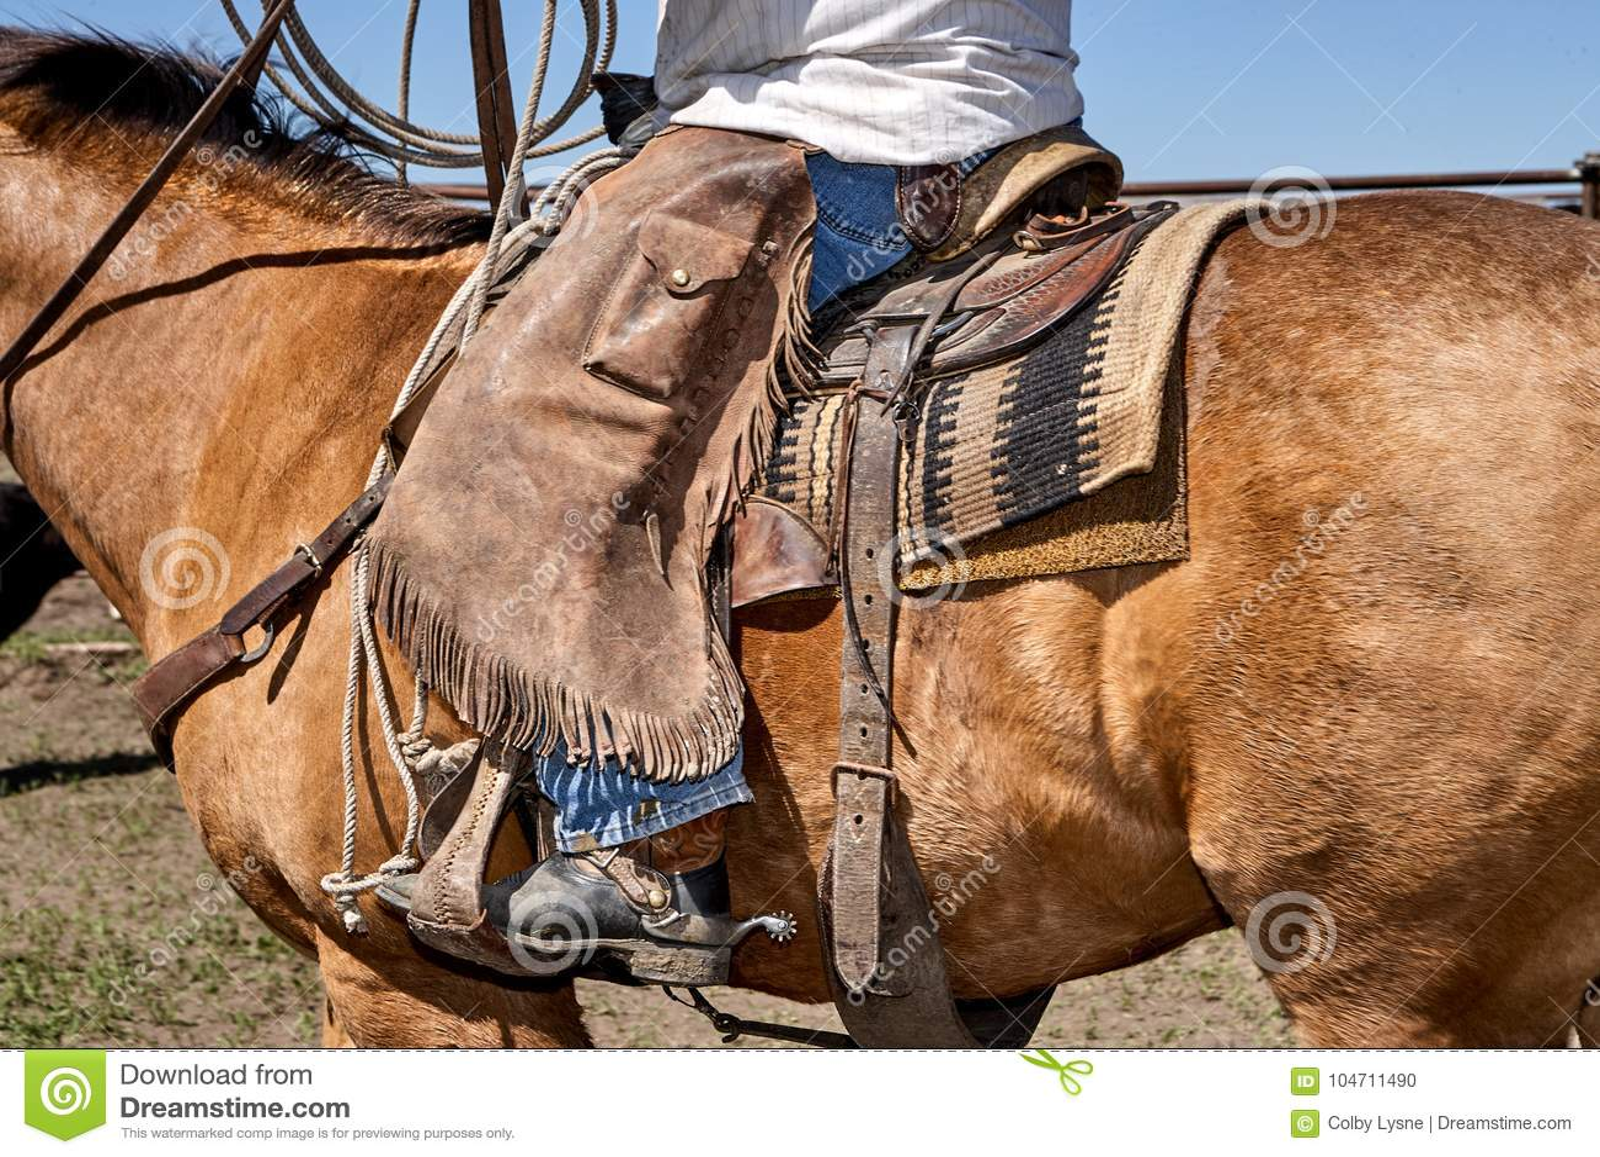 Vaqueiro ocidental tradicional nas caneleiras de couro